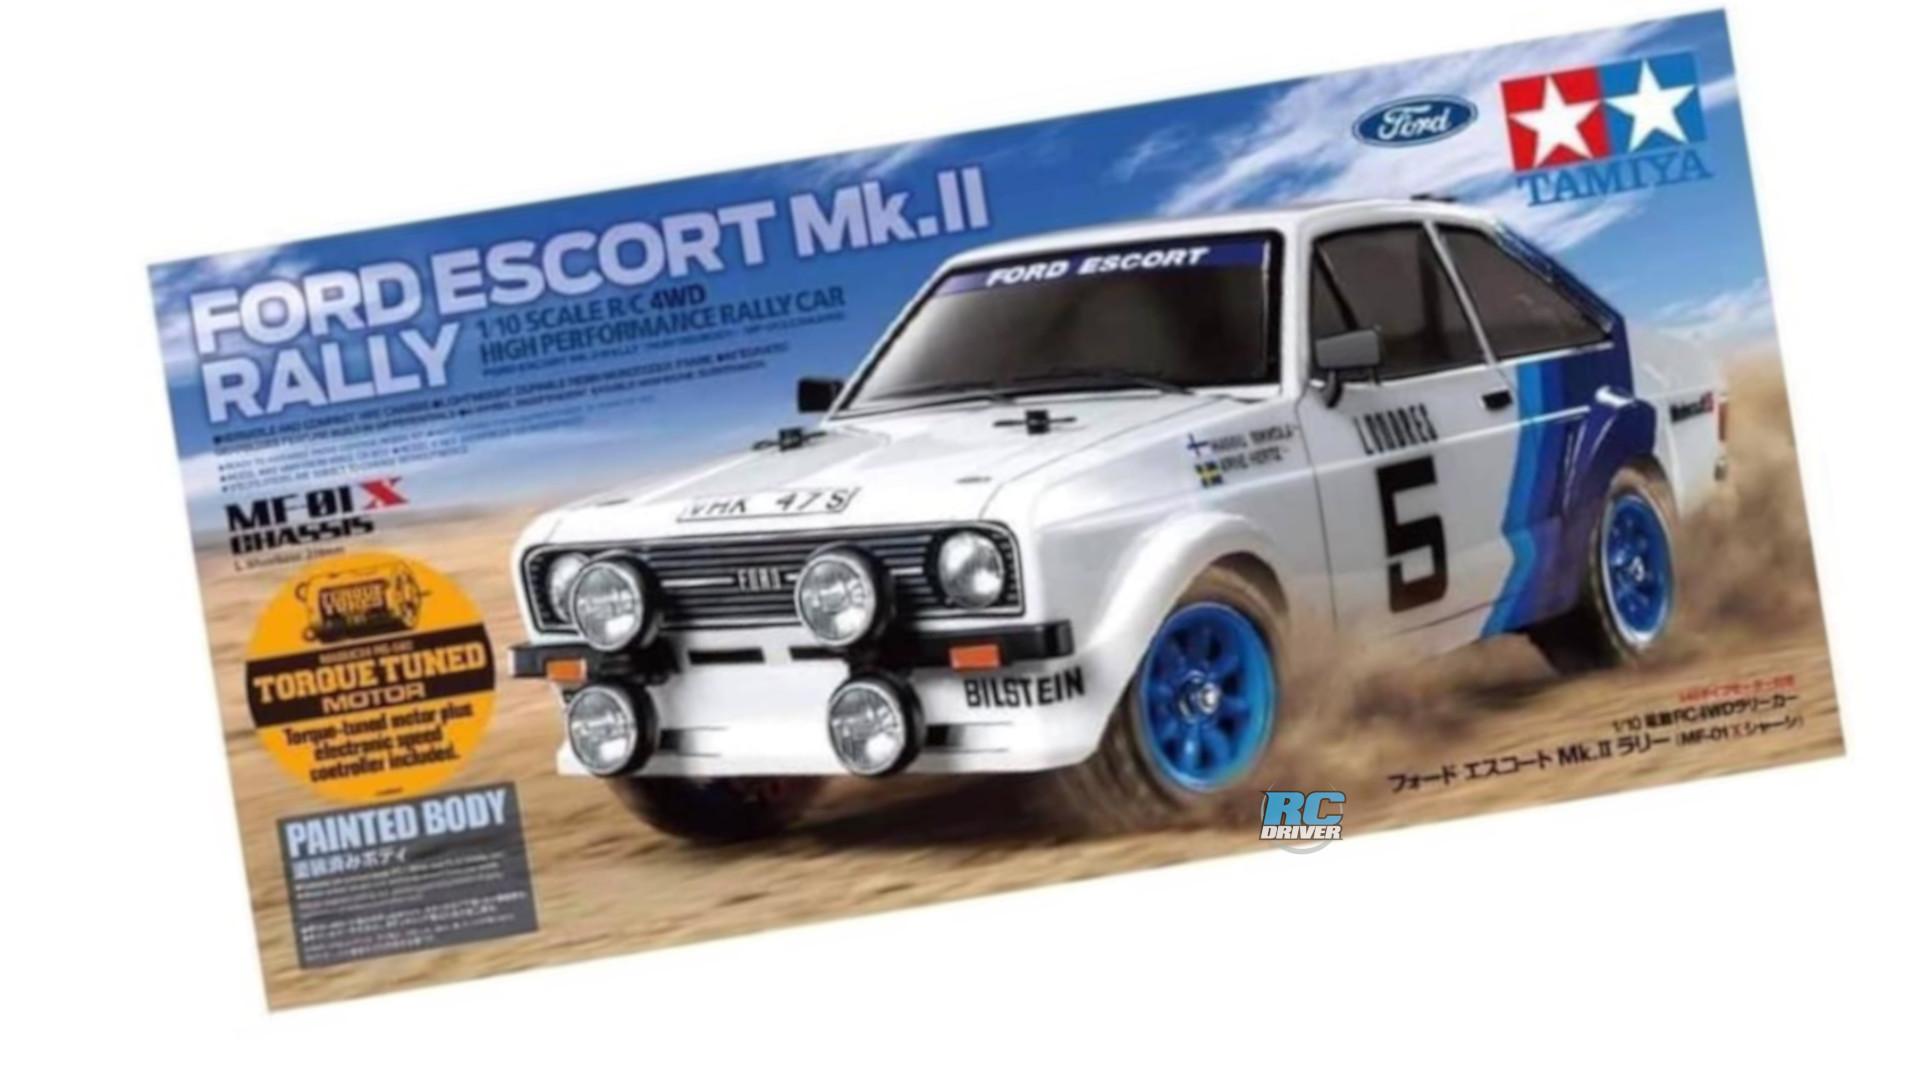 Tamiya Ford Escort Mk.II Rally with MF-01X chassis